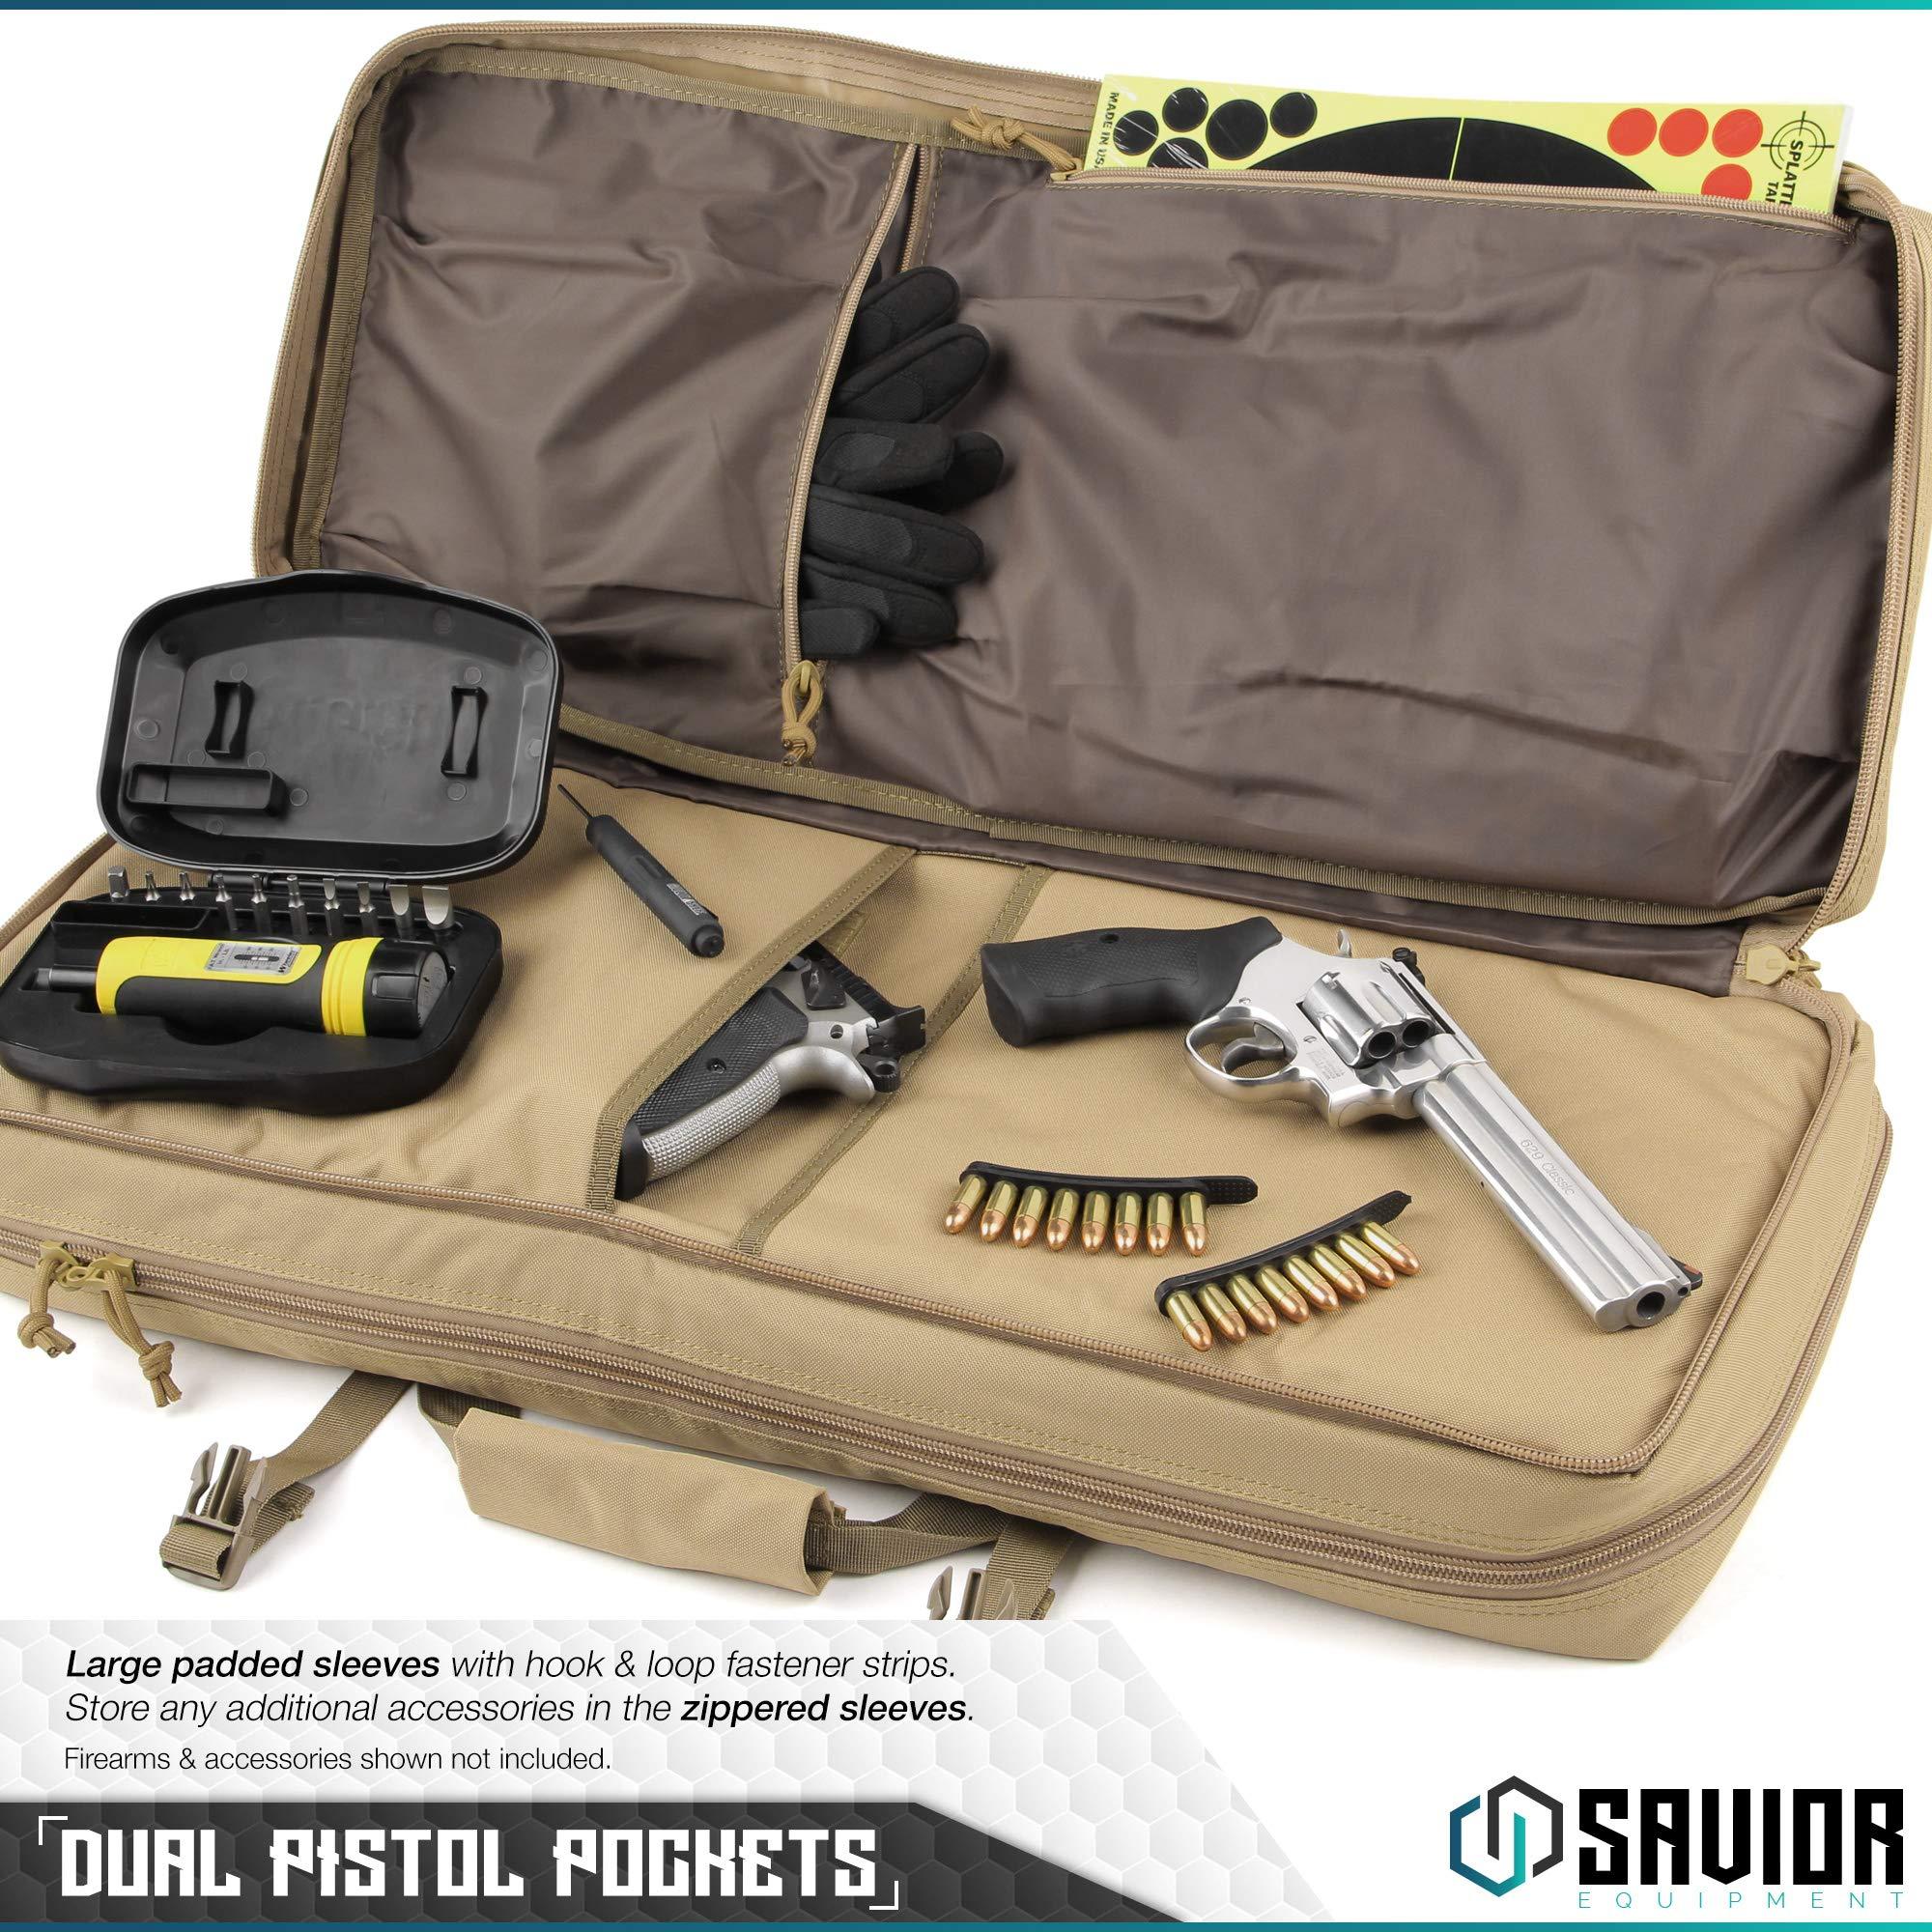 Savior Equipment American Classic Tactical Double Short Barrel Rifle Gun Case Firearm Bag - Suitable for Subgun Bullpups Carbine Shotgun SMG SBR AR AK Pistol, Available Length in 24'' 28'' 32'' by Savior Equipment (Image #4)